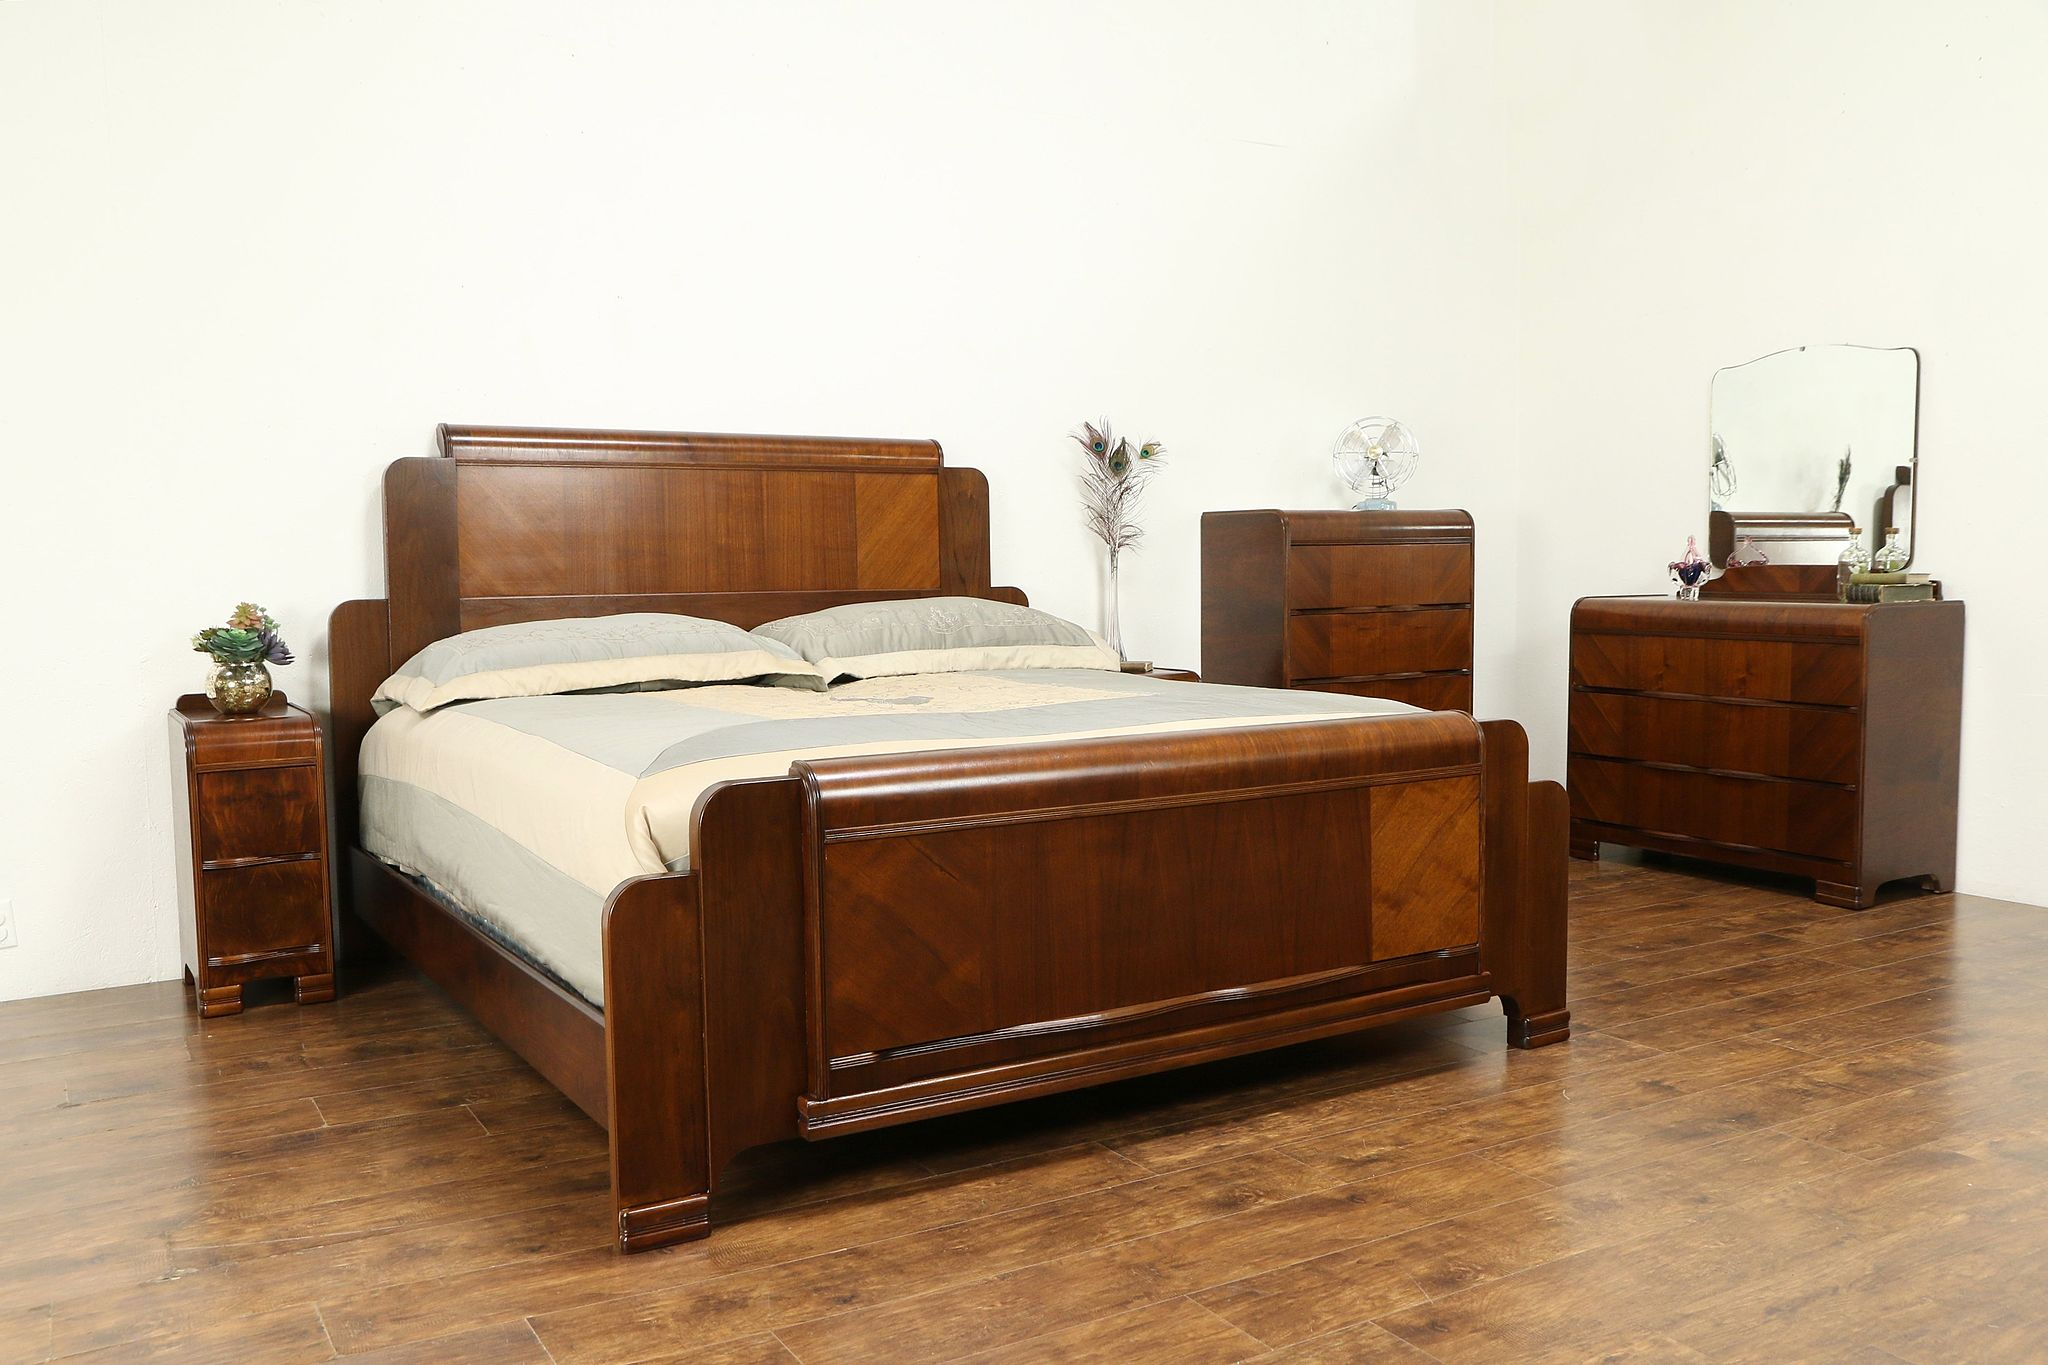 Art Deco Waterfall Design 1940 Vintage 5 Pc Bedroom Set, King Size ...